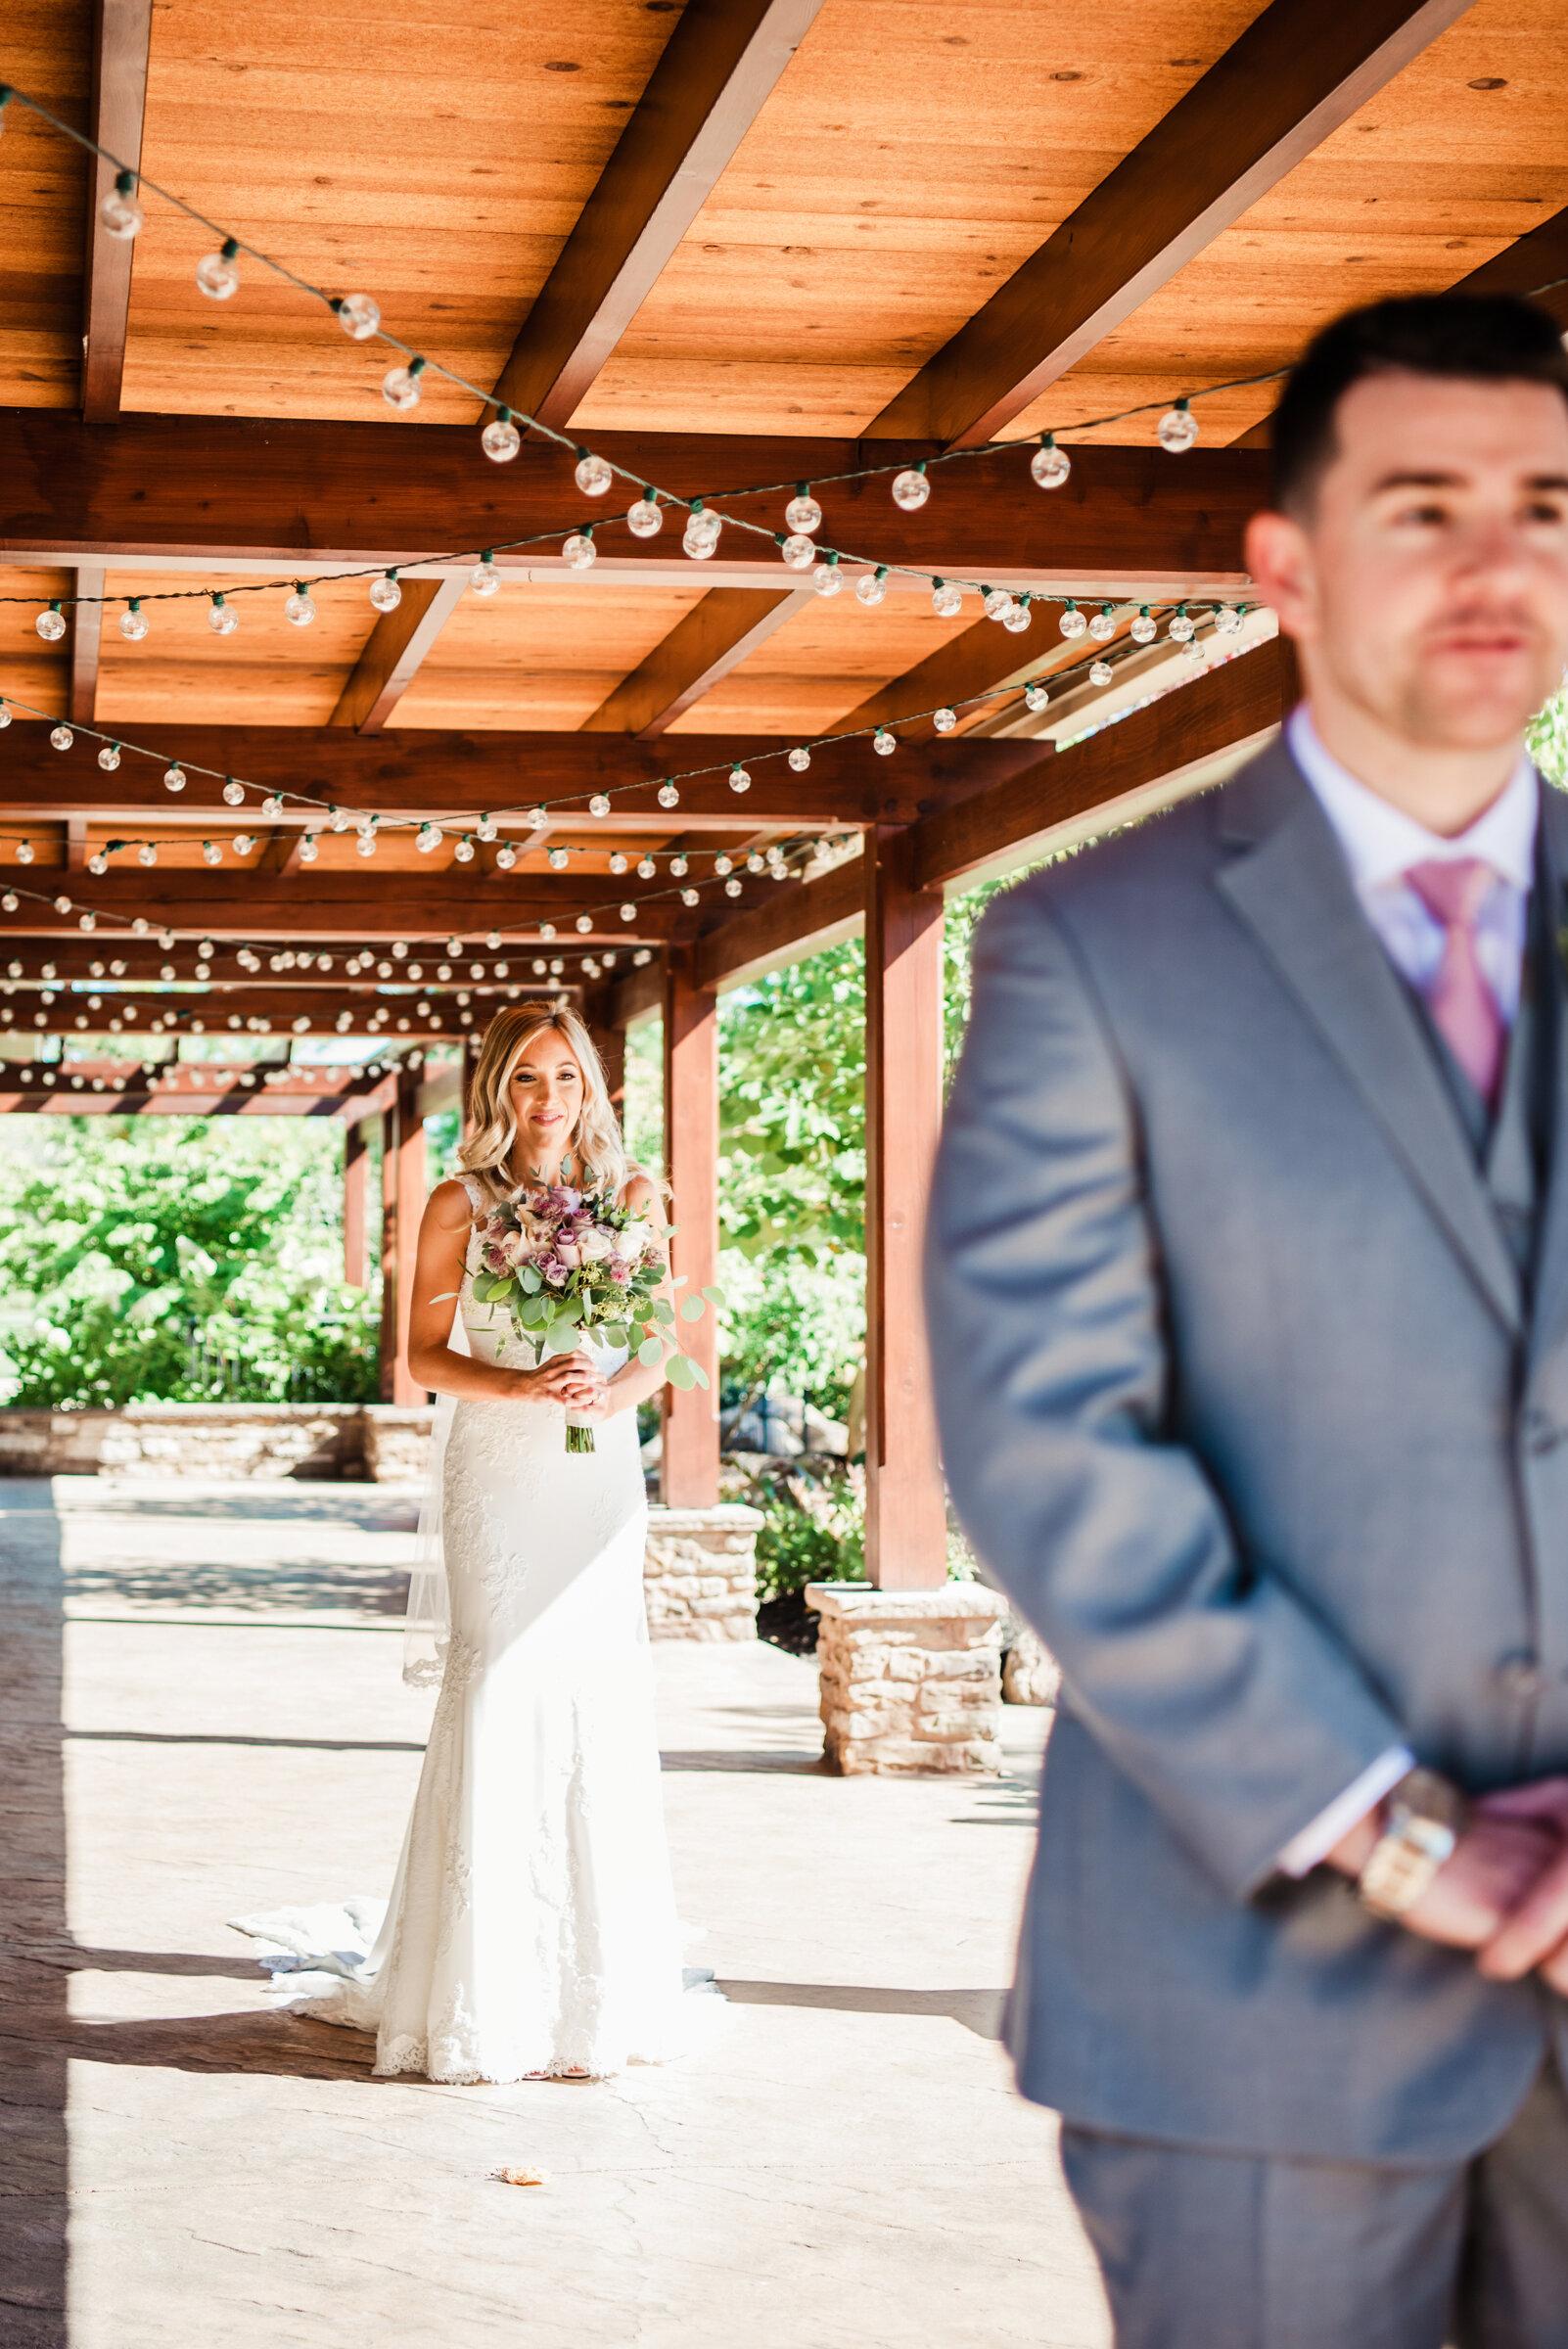 Deerfield_Country_Club_Rochester_Wedding_JILL_STUDIO_Rochester_NY_Photographer_DSC_6017.jpg